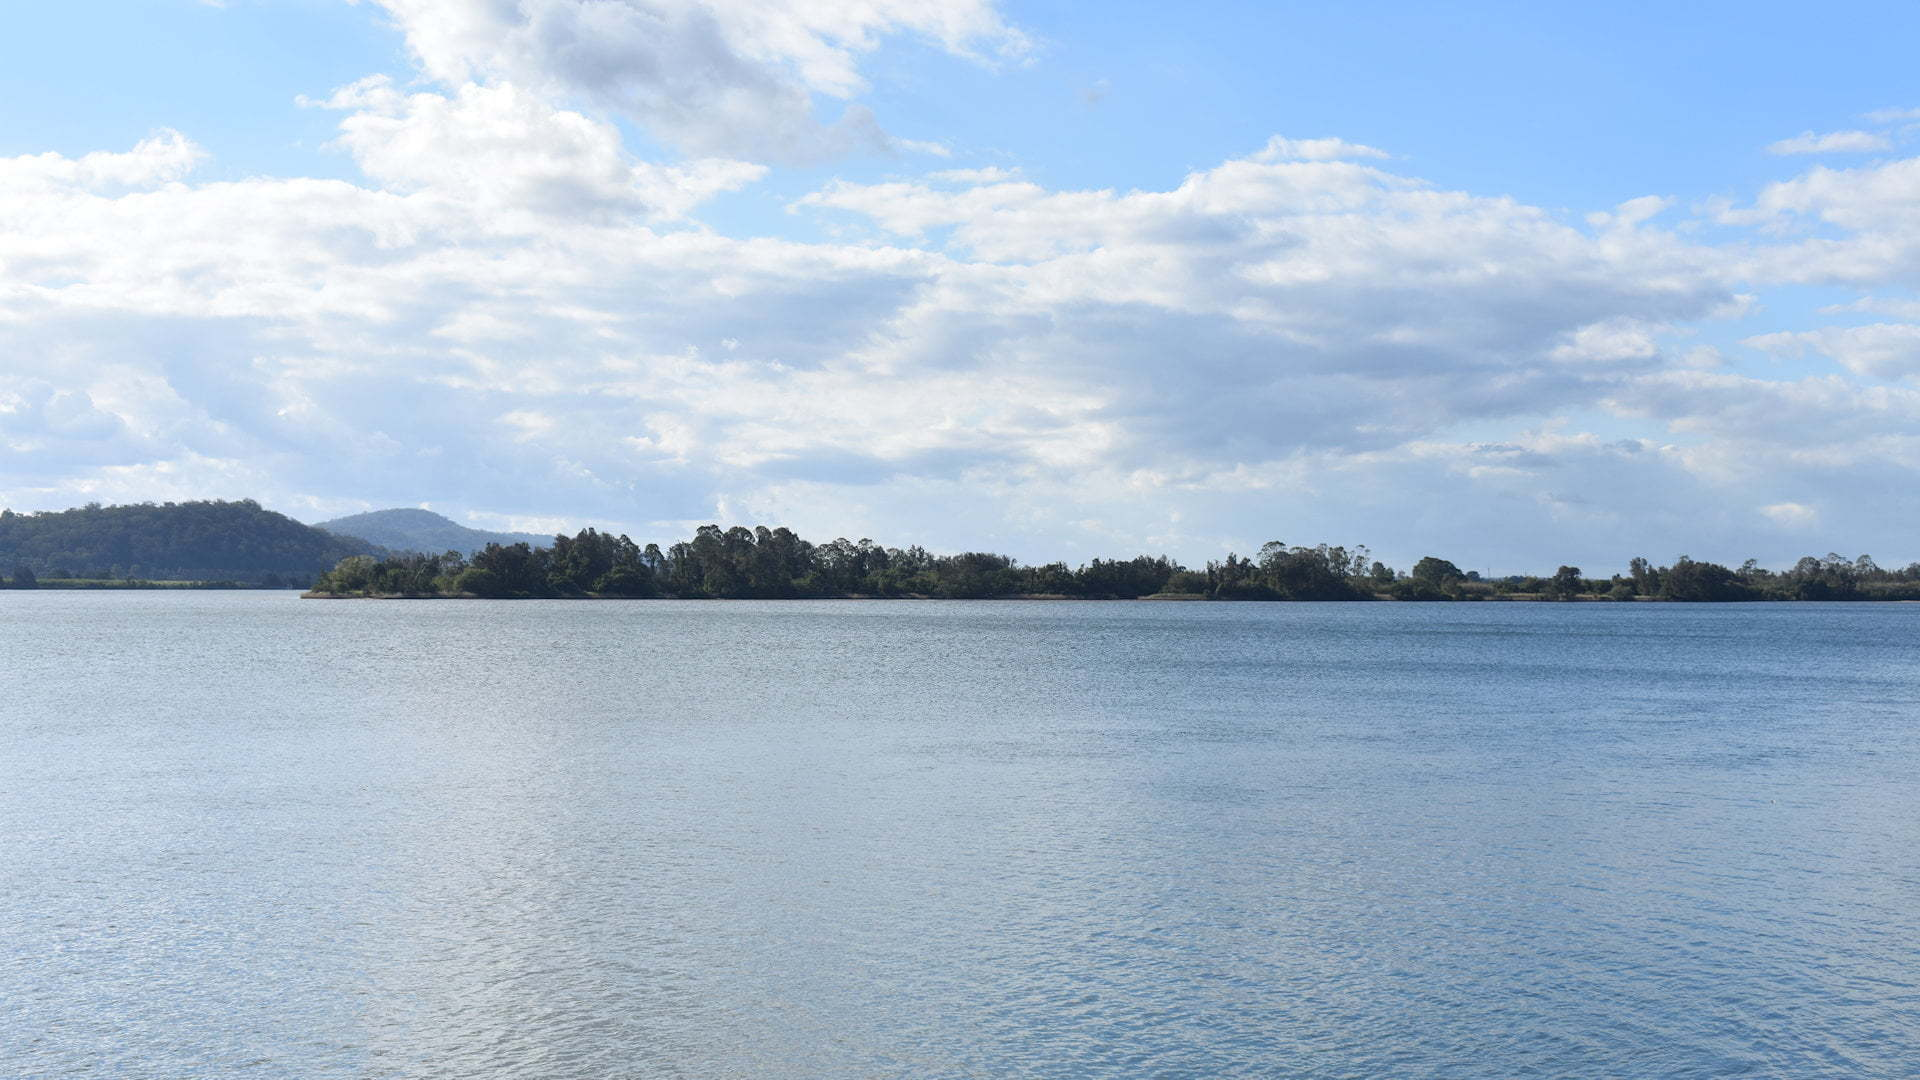 Ulugundahi Island, or Ulgundahi Island, viewed from the side of the Clarence River in Maclean